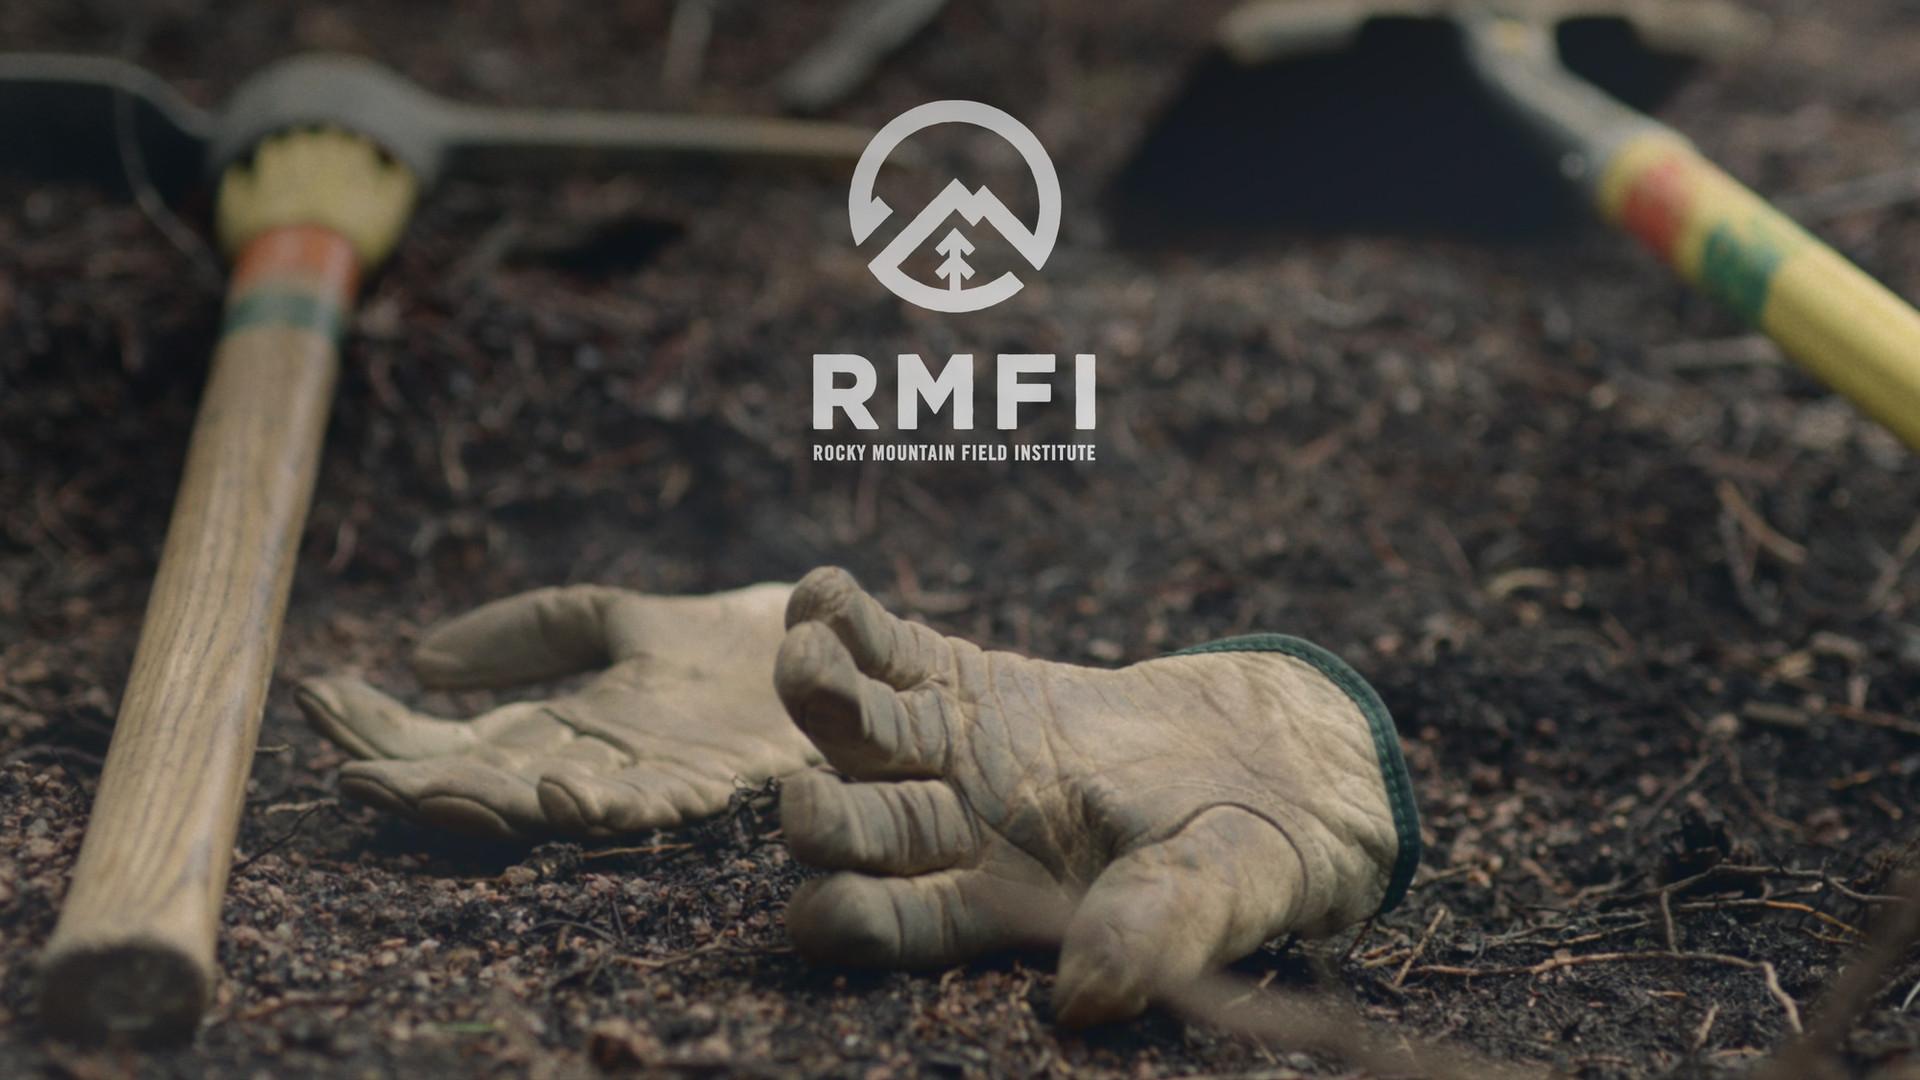 ROCKY MOUNTAIN FIELD INSTITUTE (RMFI)